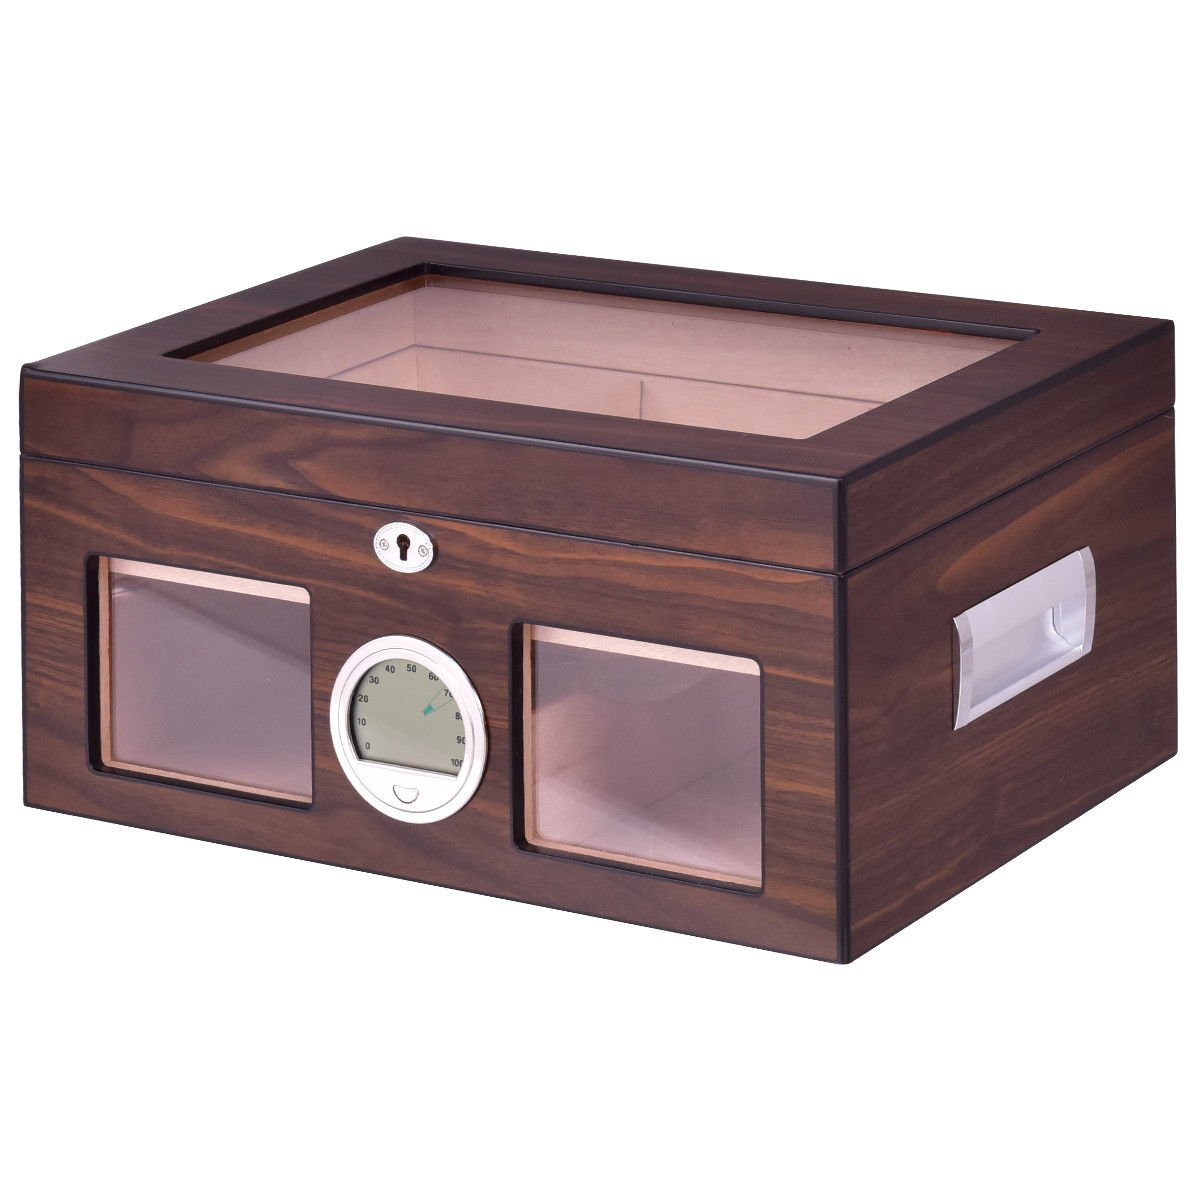 Giantex Desktop Cigar Humidor Walnut Finished Tempered Glasstop Lockable w/Humidifier Hygrometer 50-100 Cigars